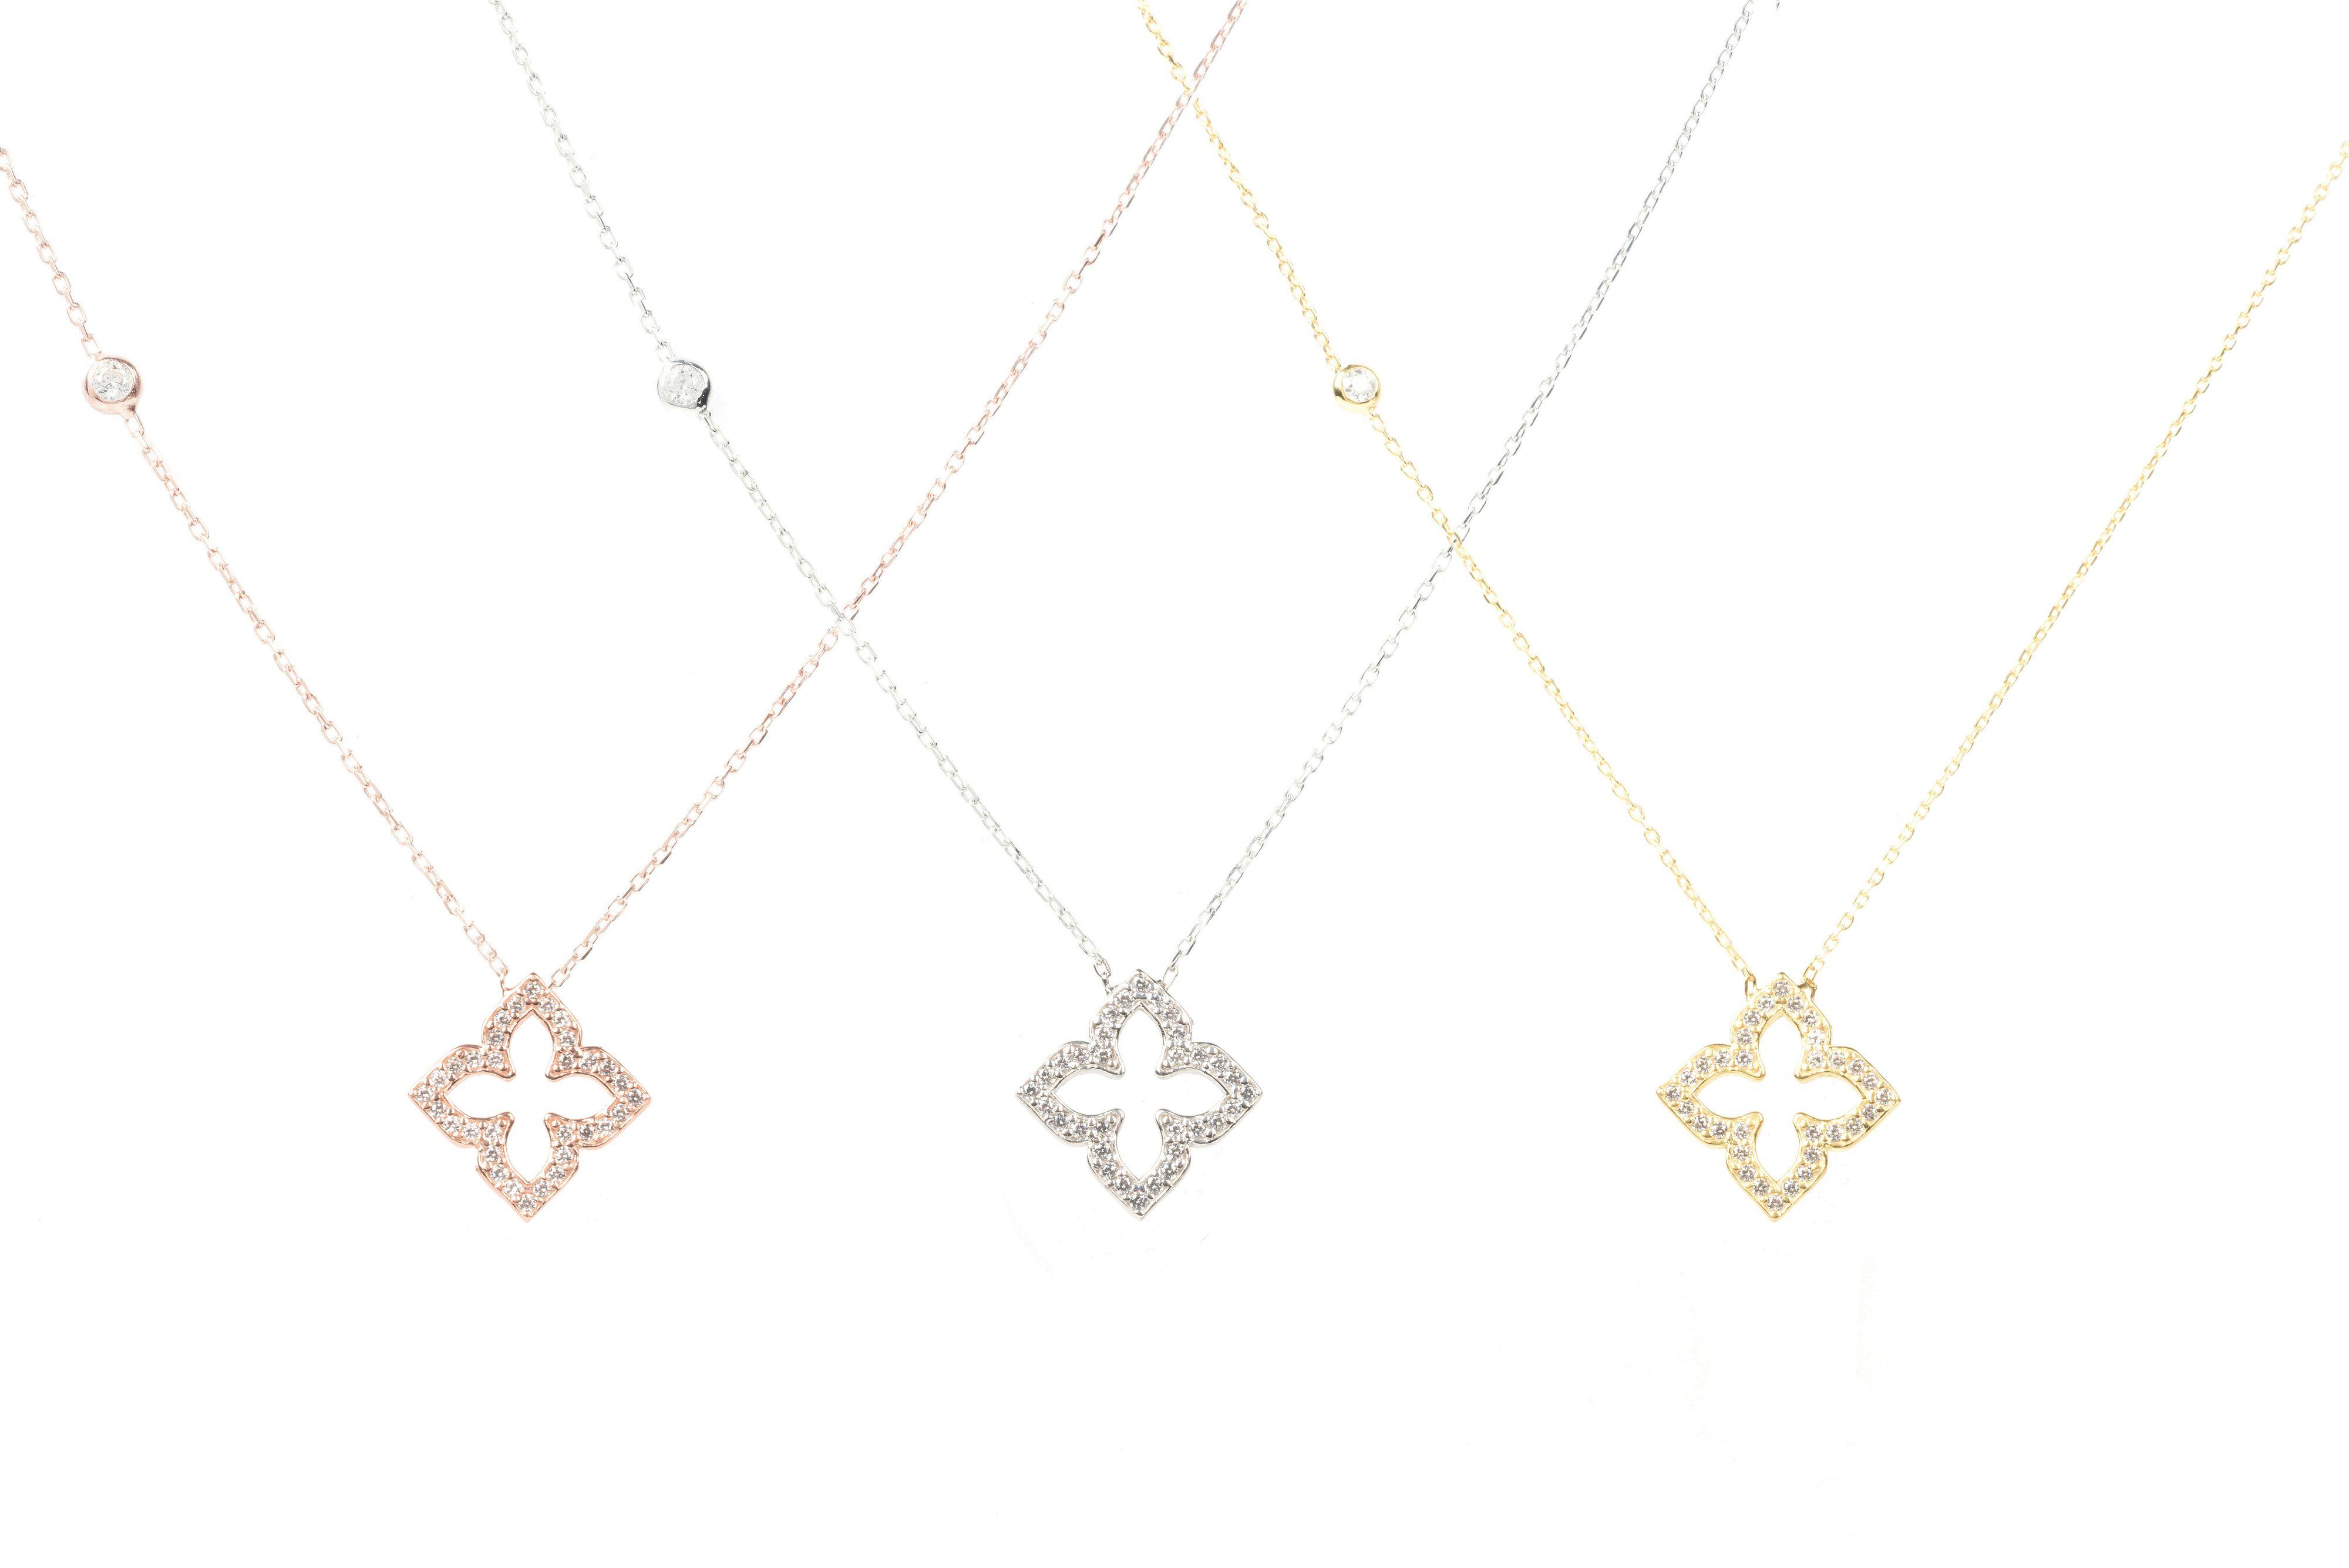 LÁTELITA London Open Pointed Clover Necklace Gold in Metallic